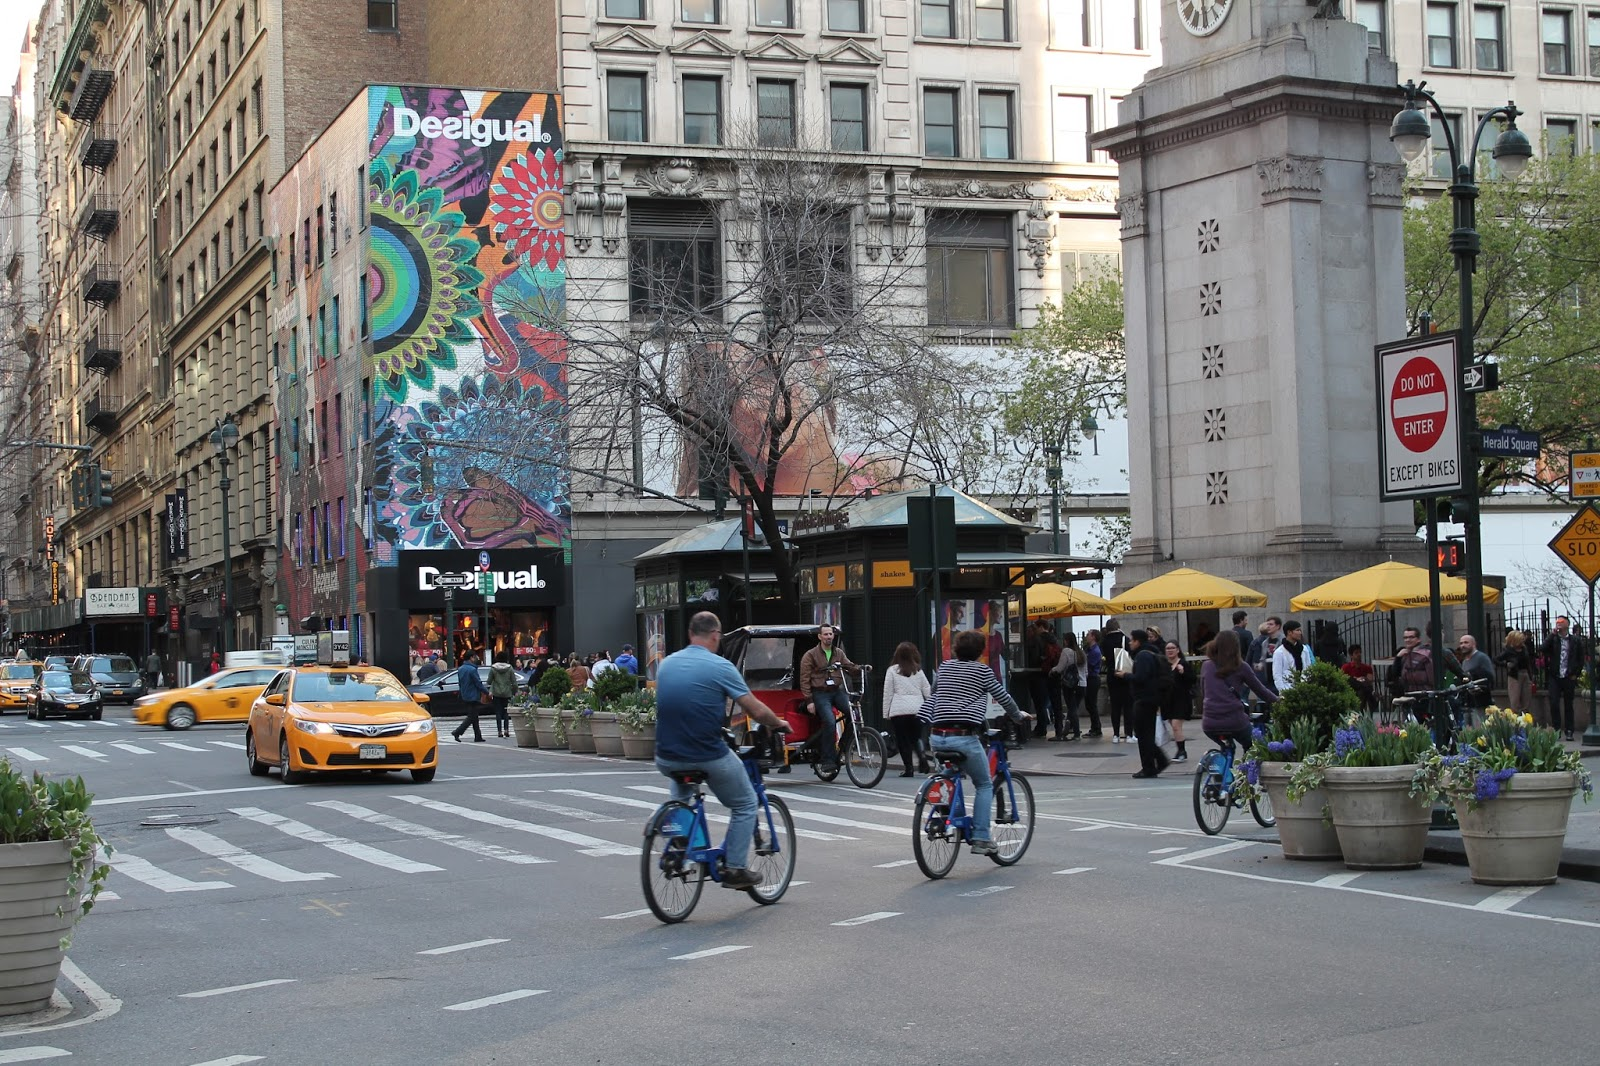 usa, nyc, new york, city, empire state building, top, vue, panorama, panoramique, coucher de soleil, sunshine, soleil, voyage, trip2live, road trip, holidays, airbnb, ceetiz, desigual, herald square